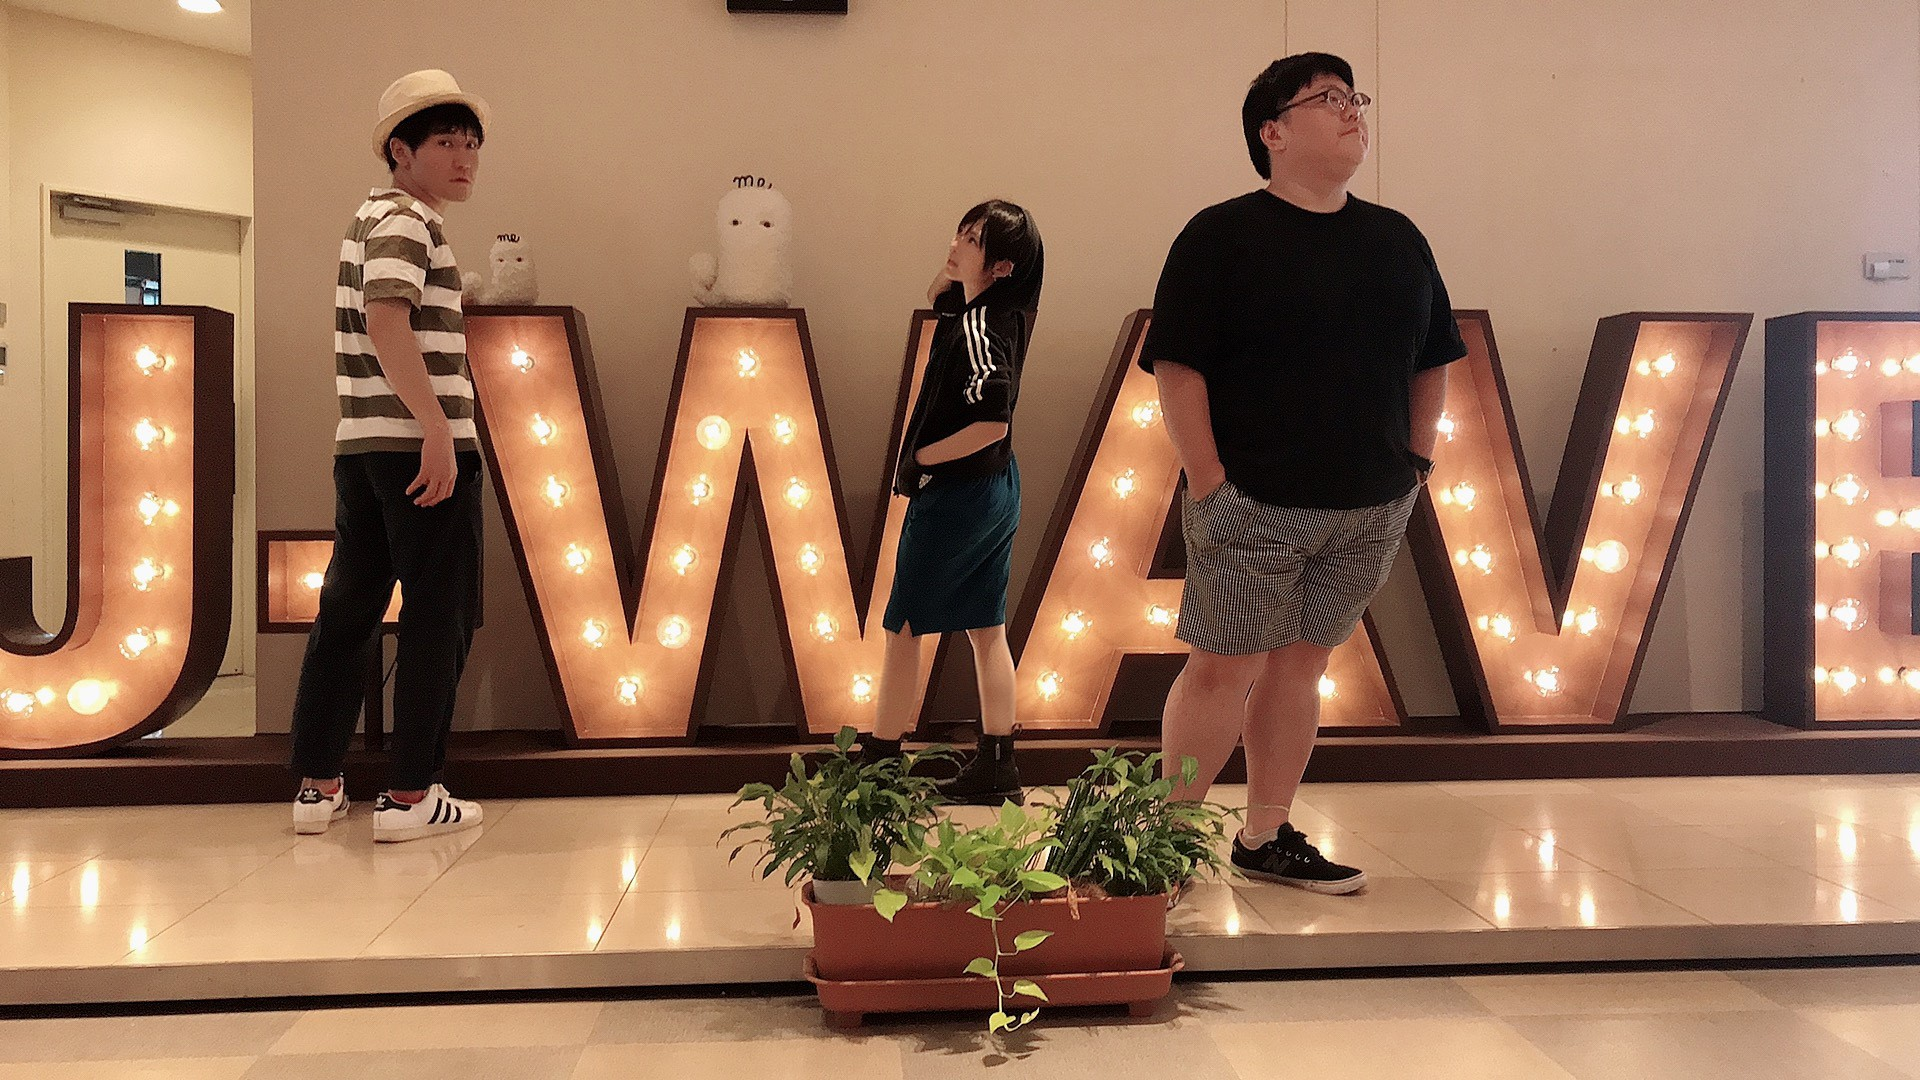 J-WAVEで放送中の番組『SPARK』(火曜ナビゲーター:雫<ポルカドットスティングレイ>)